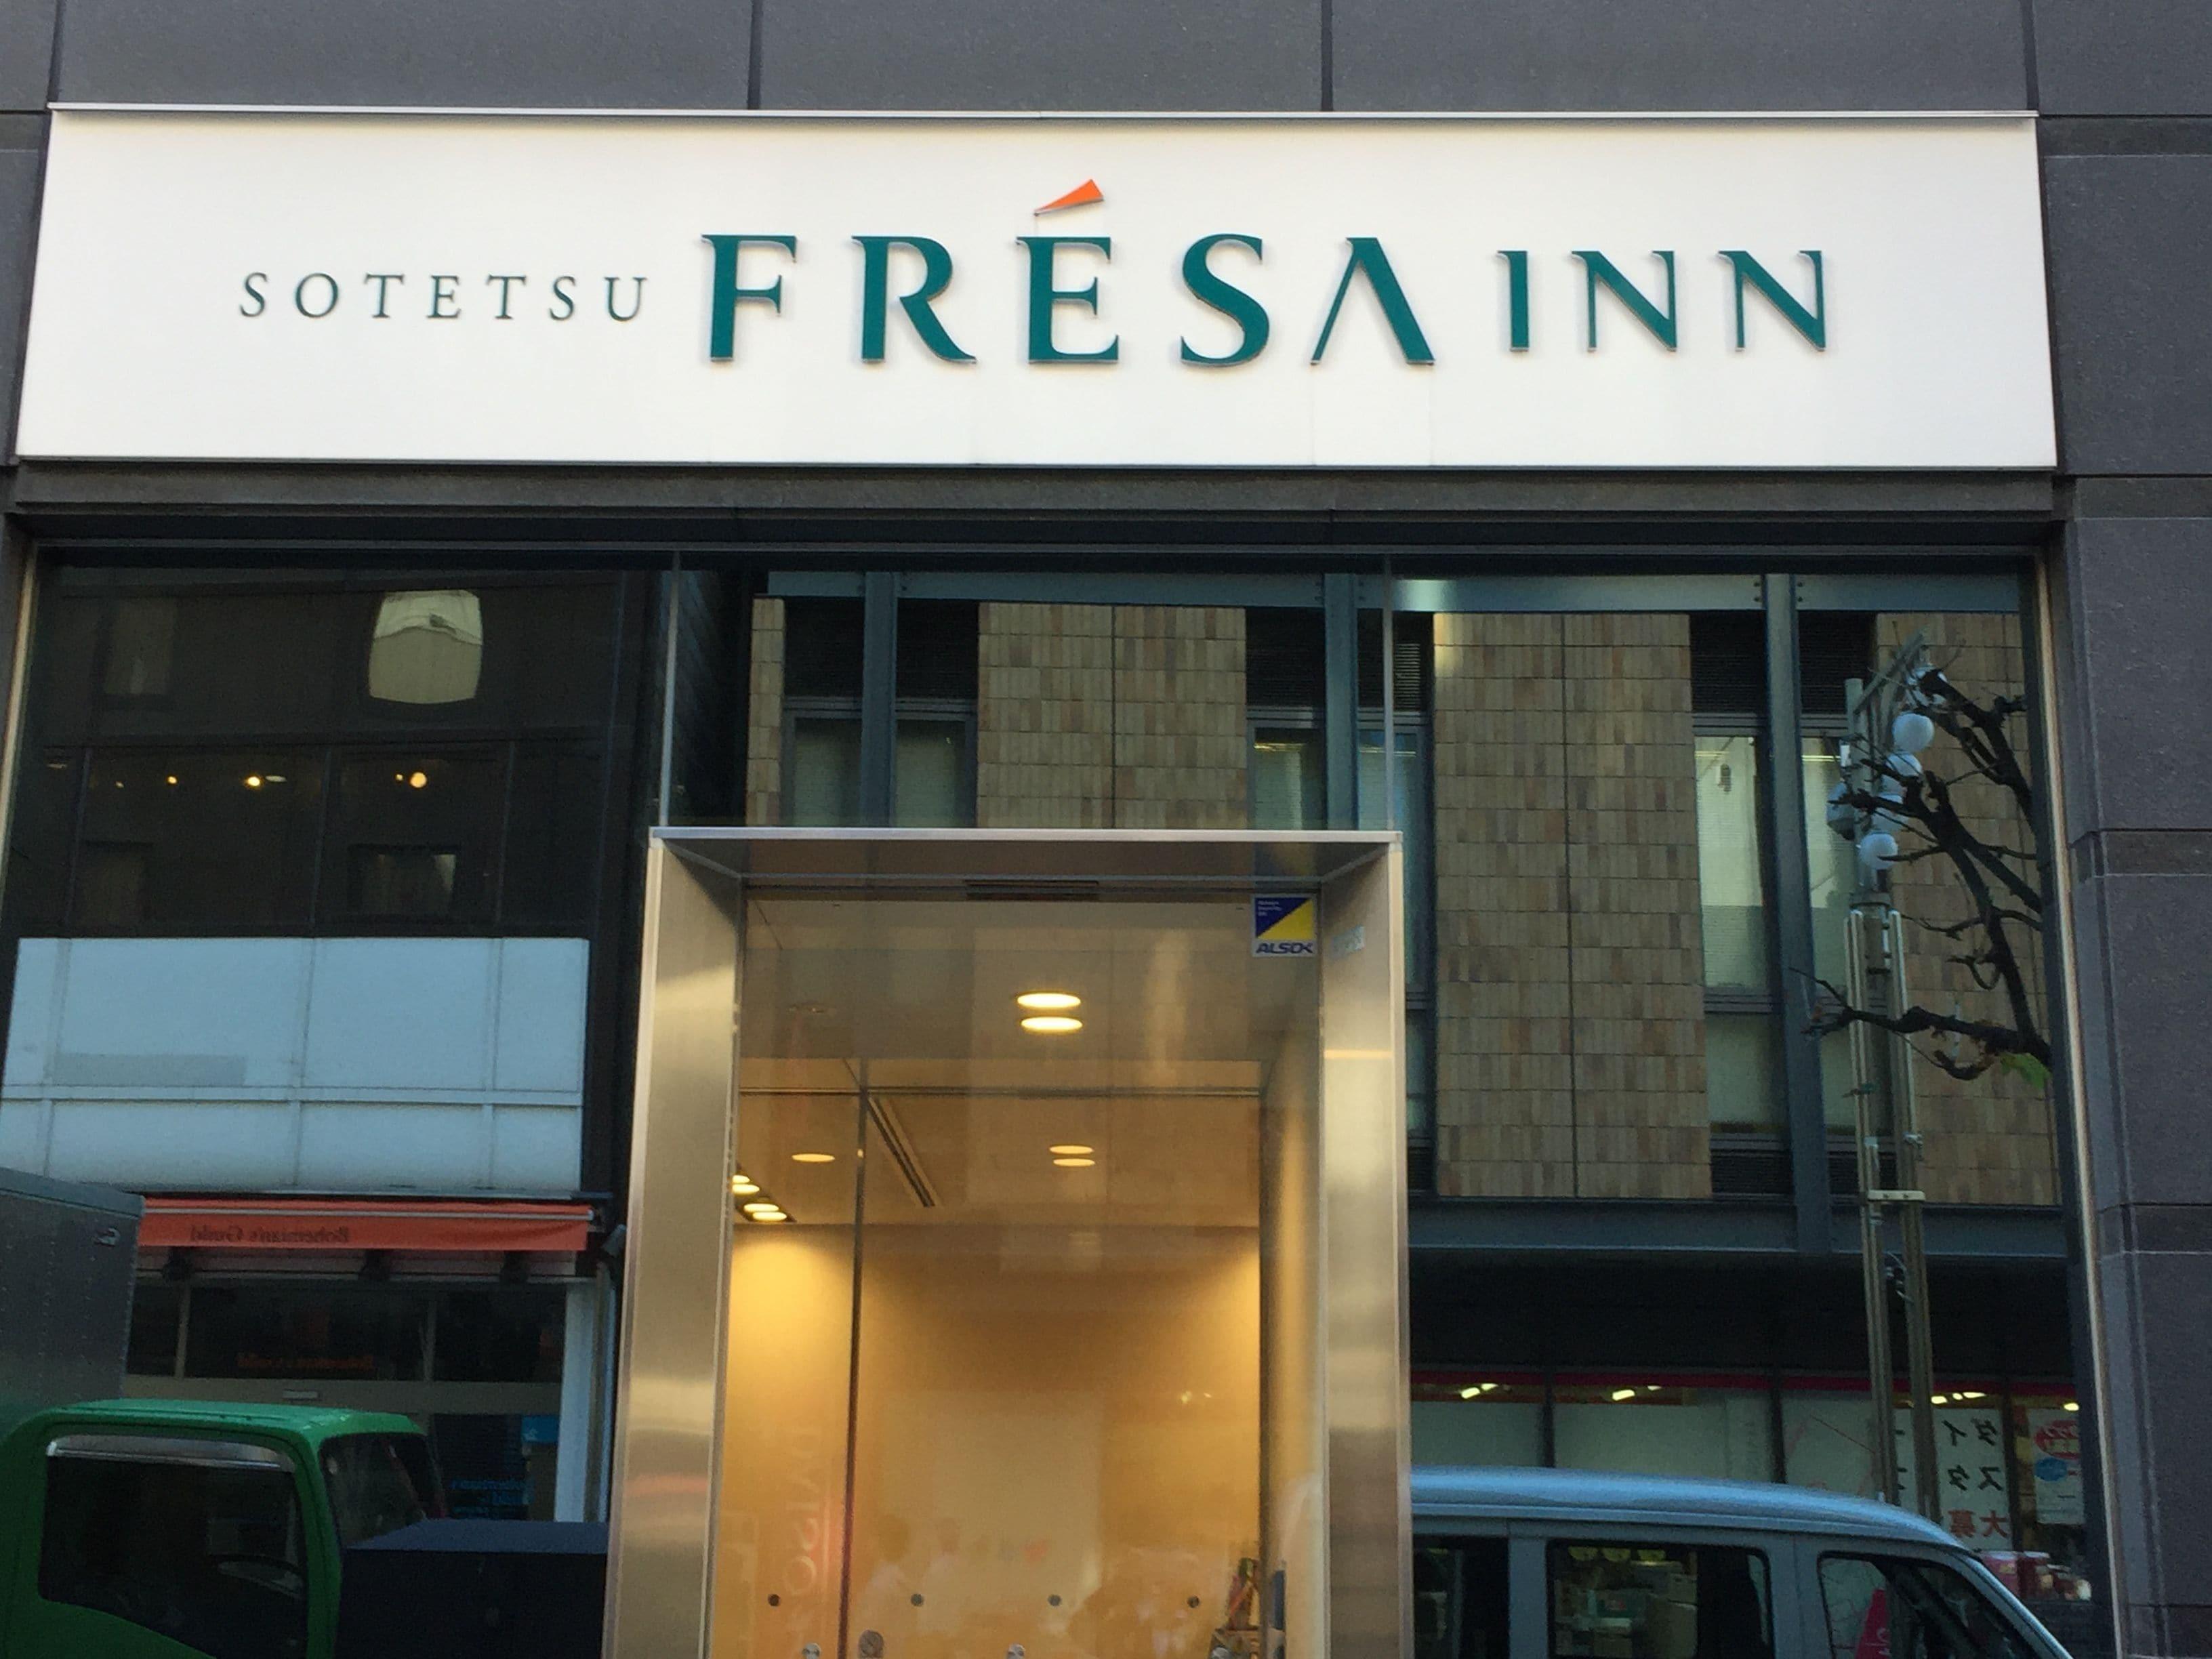 Sotetsu Fresa Inn Ochanomizu-Jimbocho